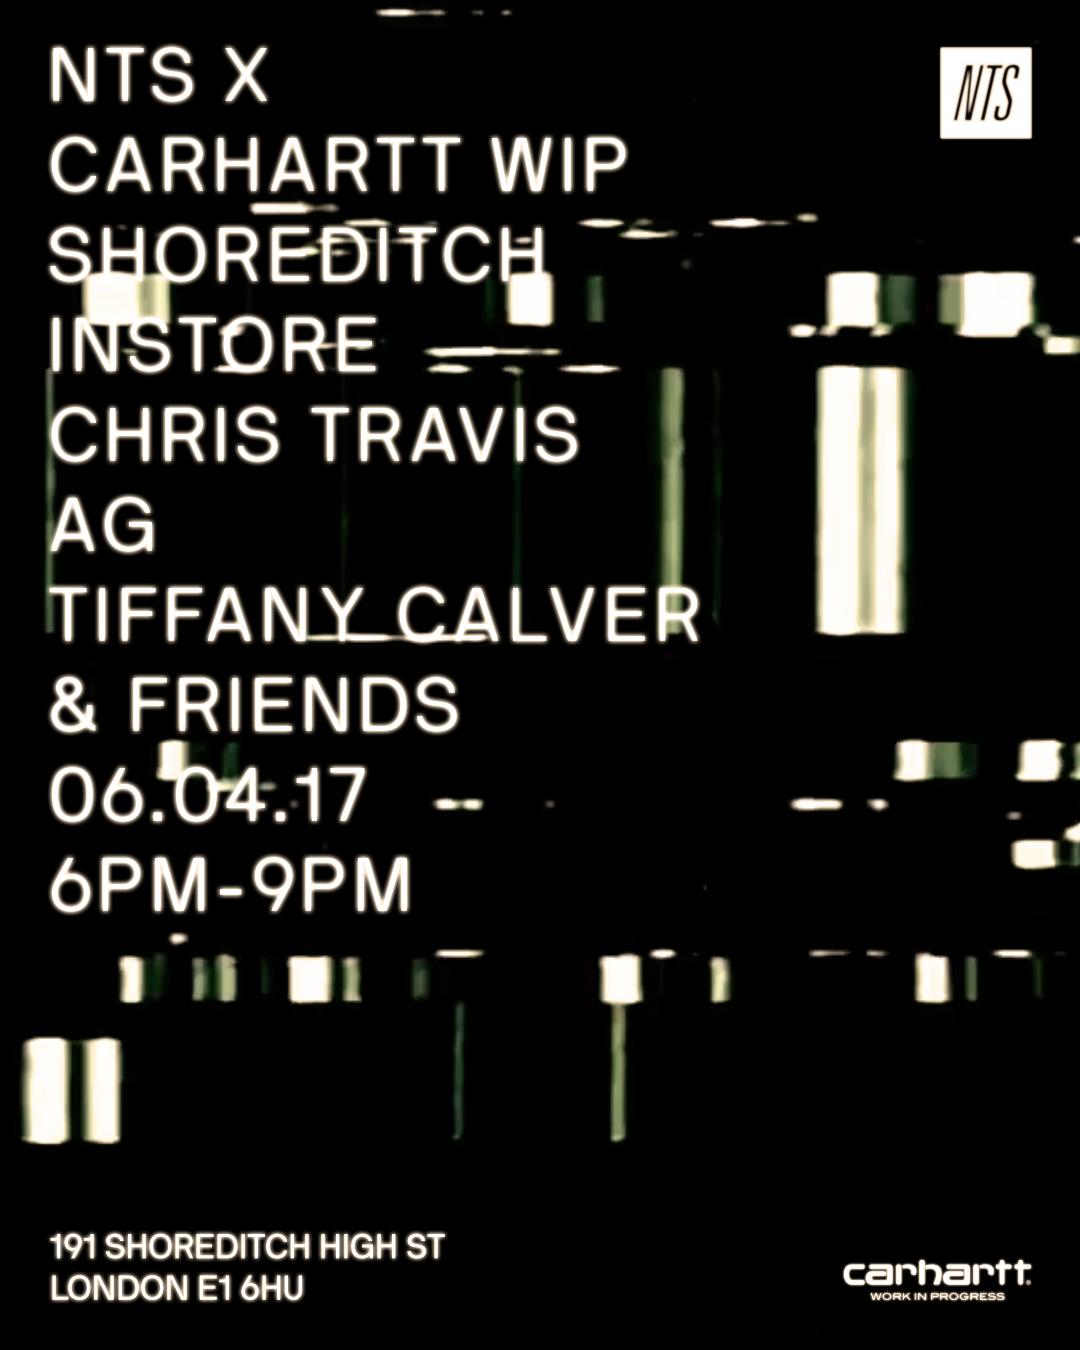 NTS X Carhartt Instore-Chris Travis+AG+Tiffany Calver-Still.png